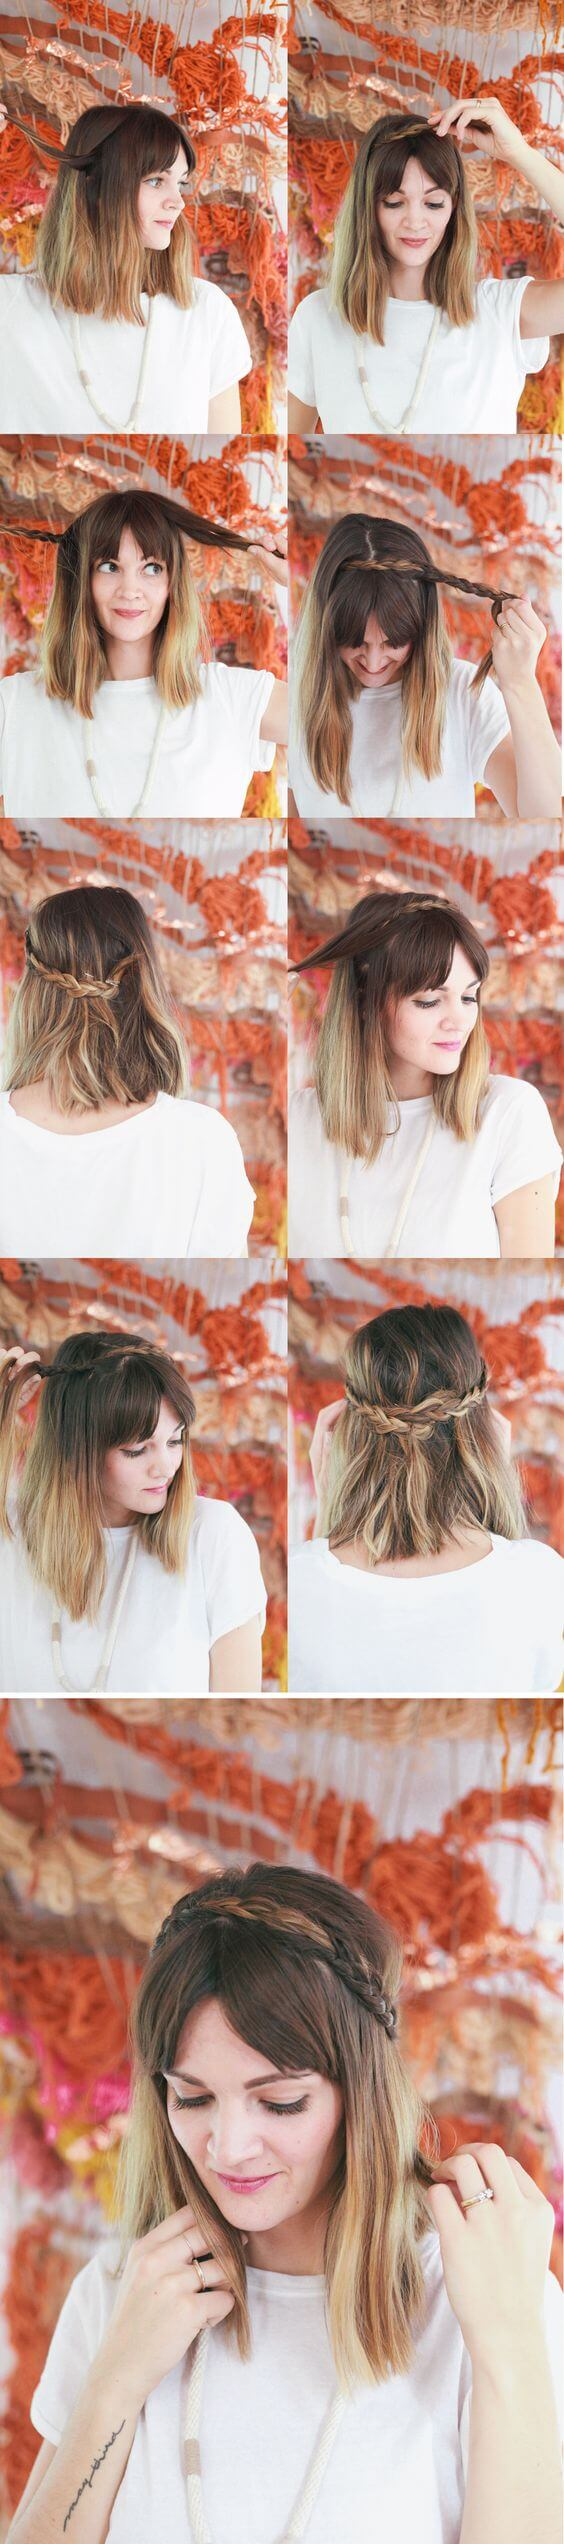 Braid Headband Hairstyle in greek style Greek hairstyle for short hair (Step by step tutorial)